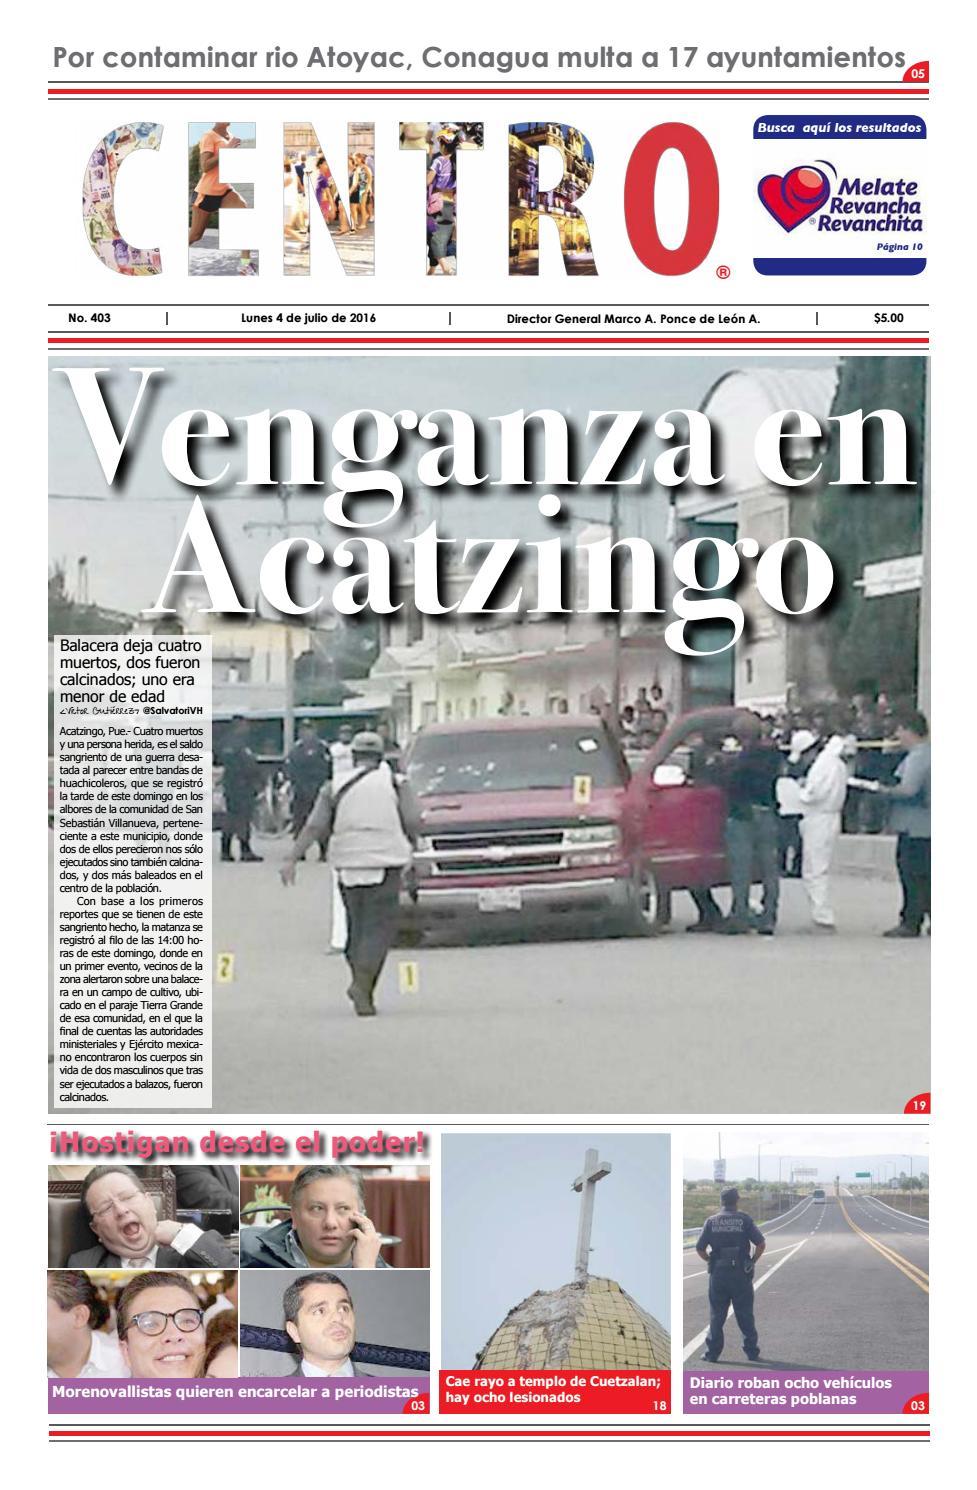 Venganza en Acatzingo by Centro Online - issuu